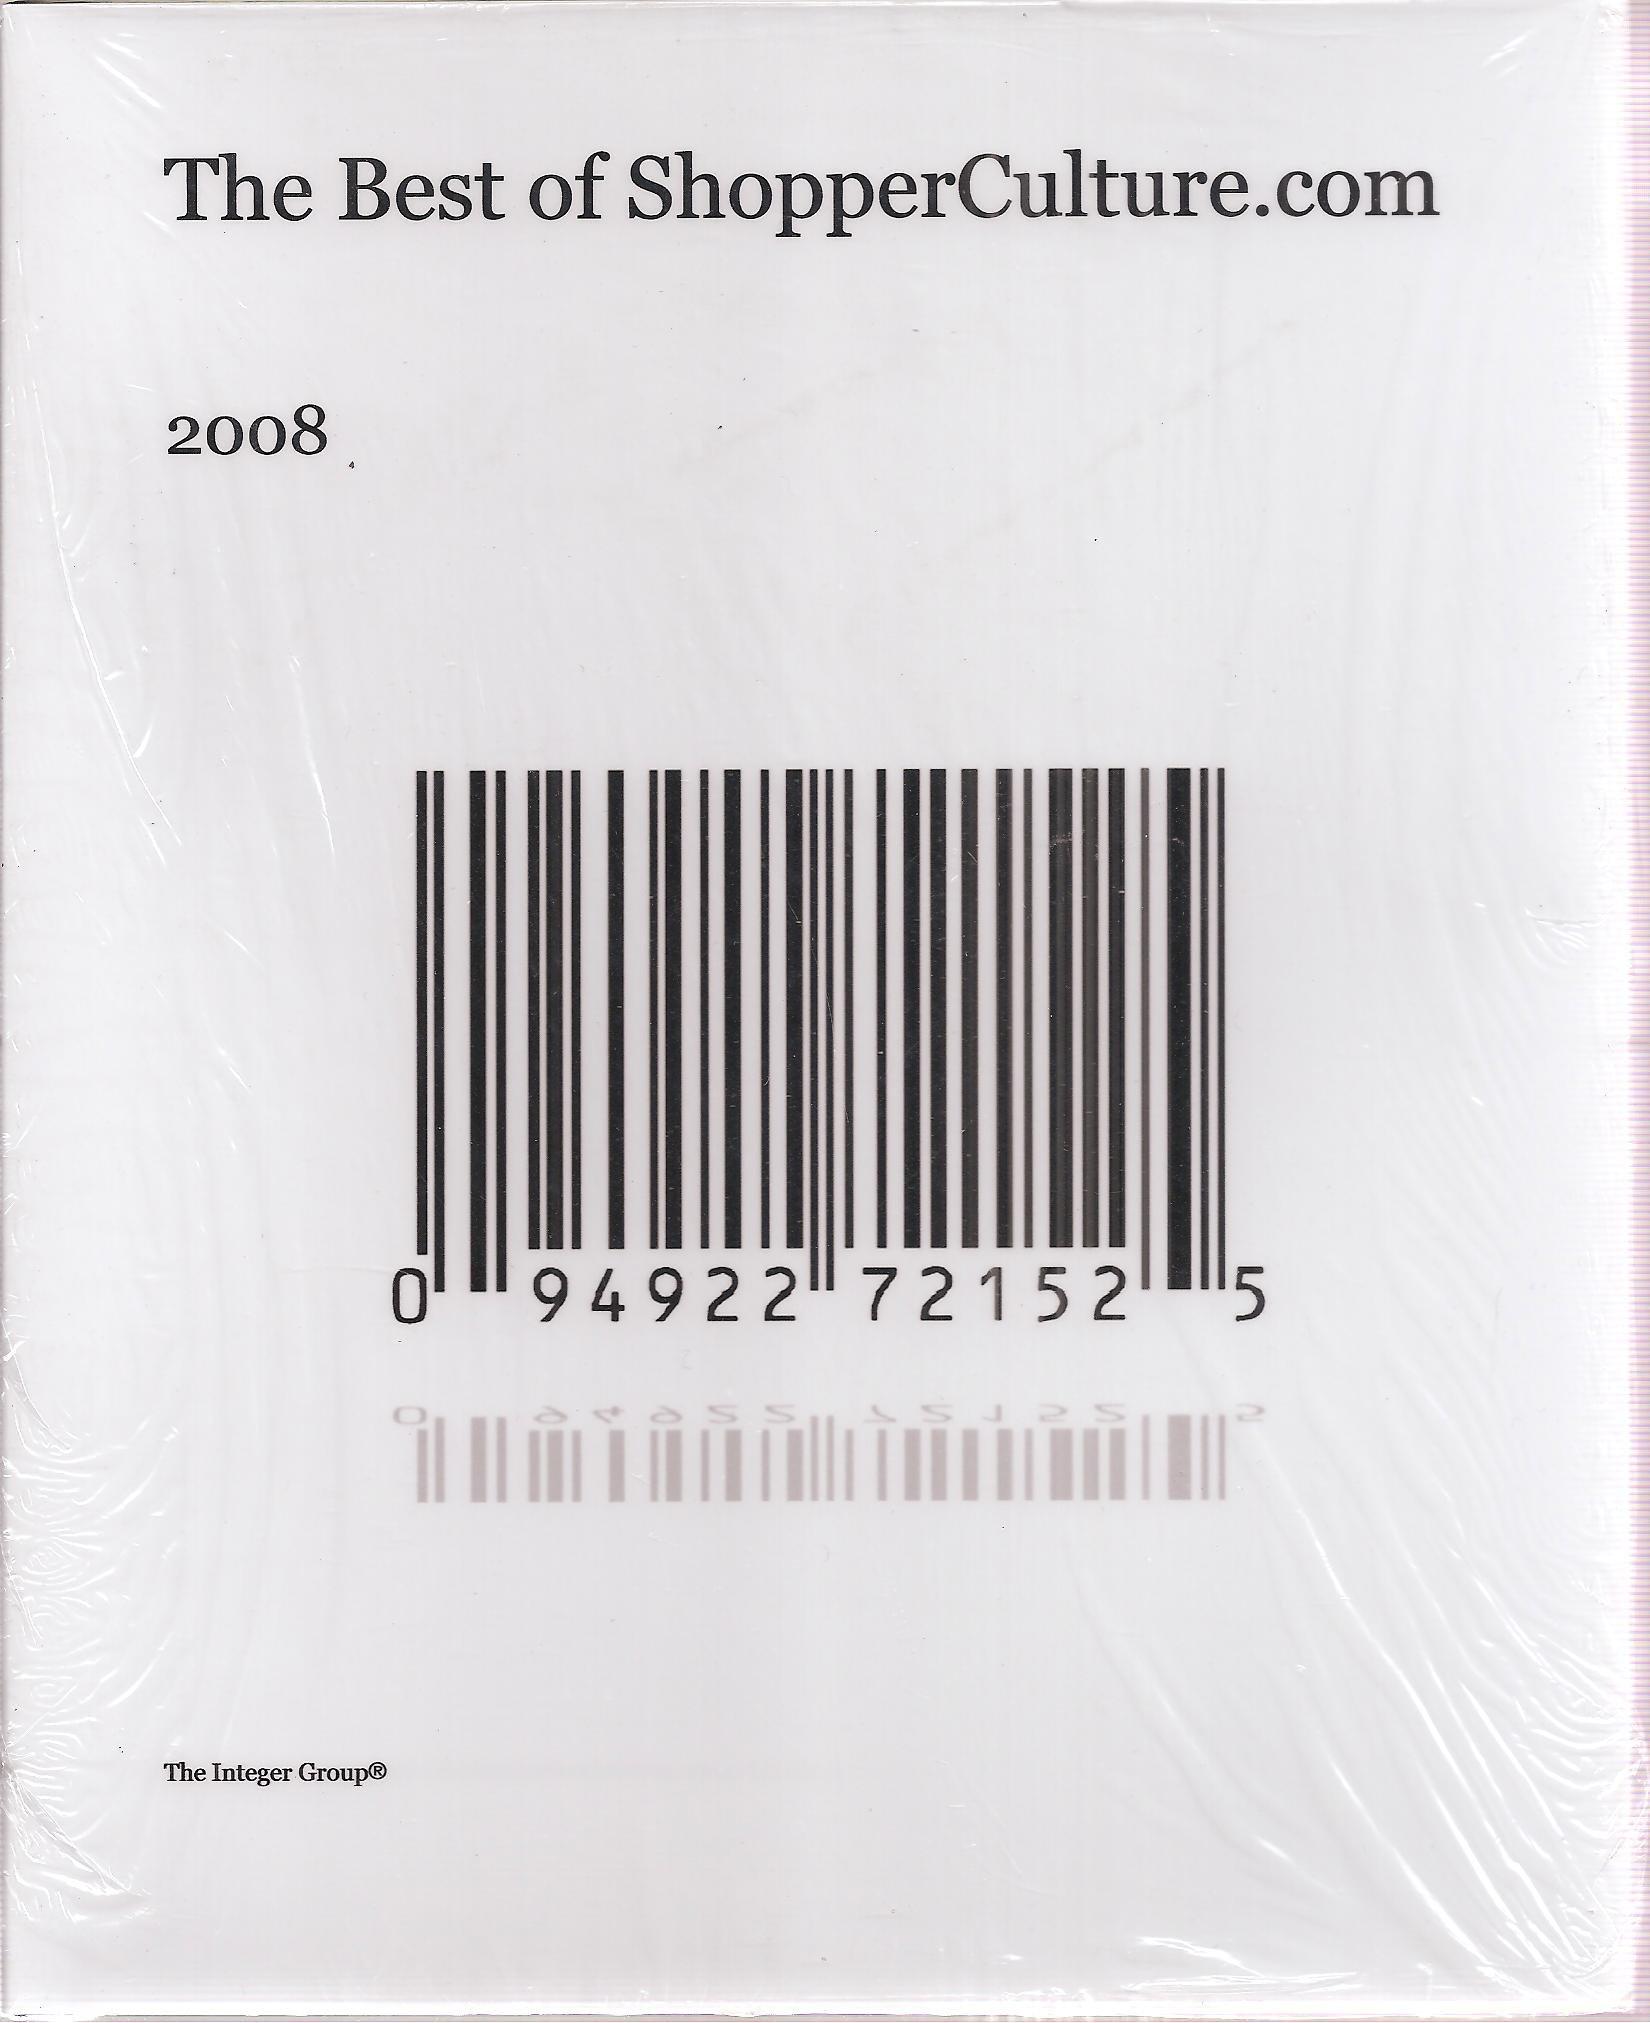 The Best of ShopperCulture.com 2008 PDF